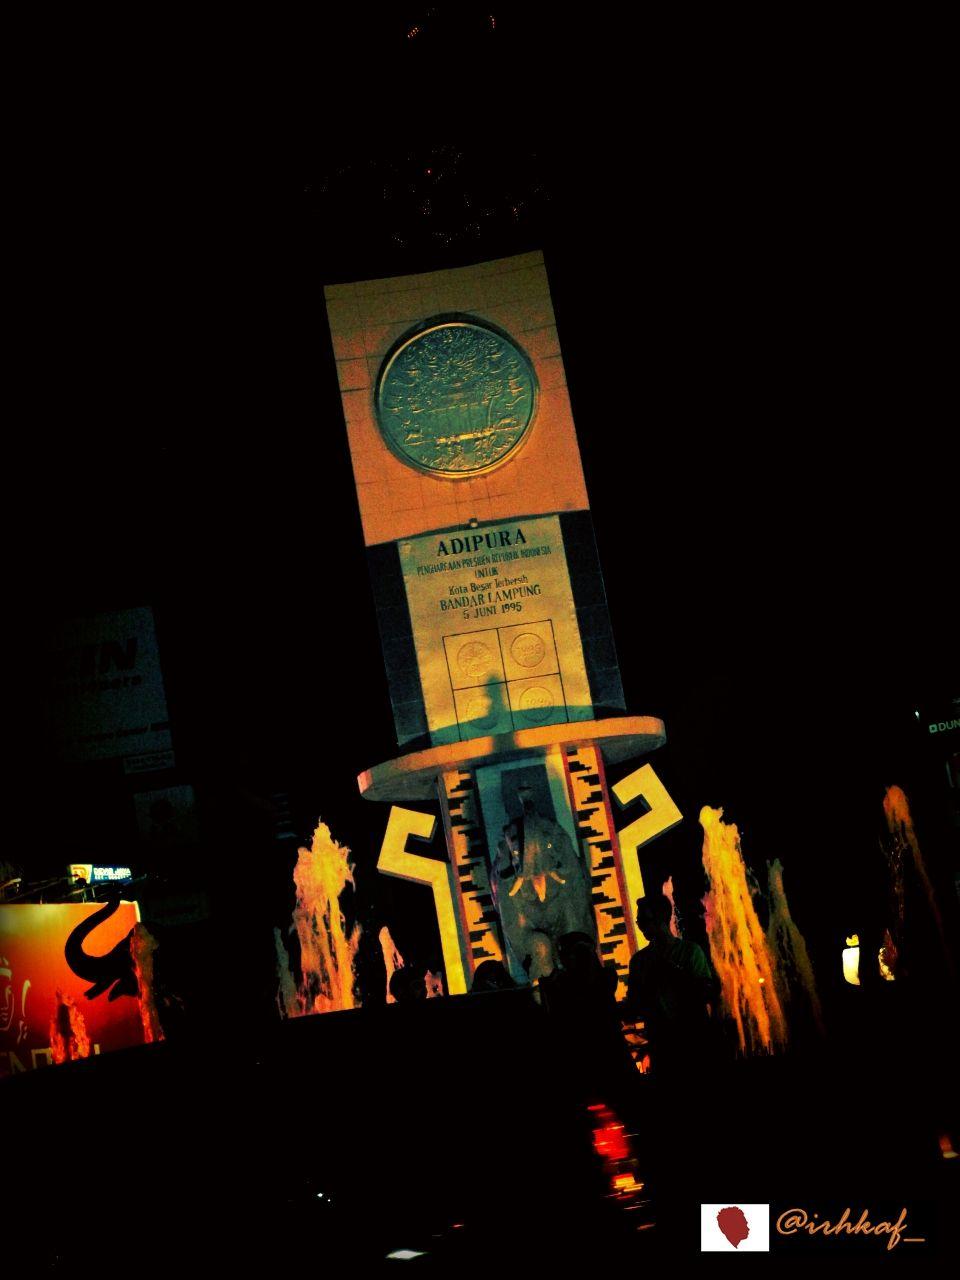 Tugu Adipura Ikon Kota Bandar Lampung Indonesia Bandarlampung Tuguadipura Gajahlampung